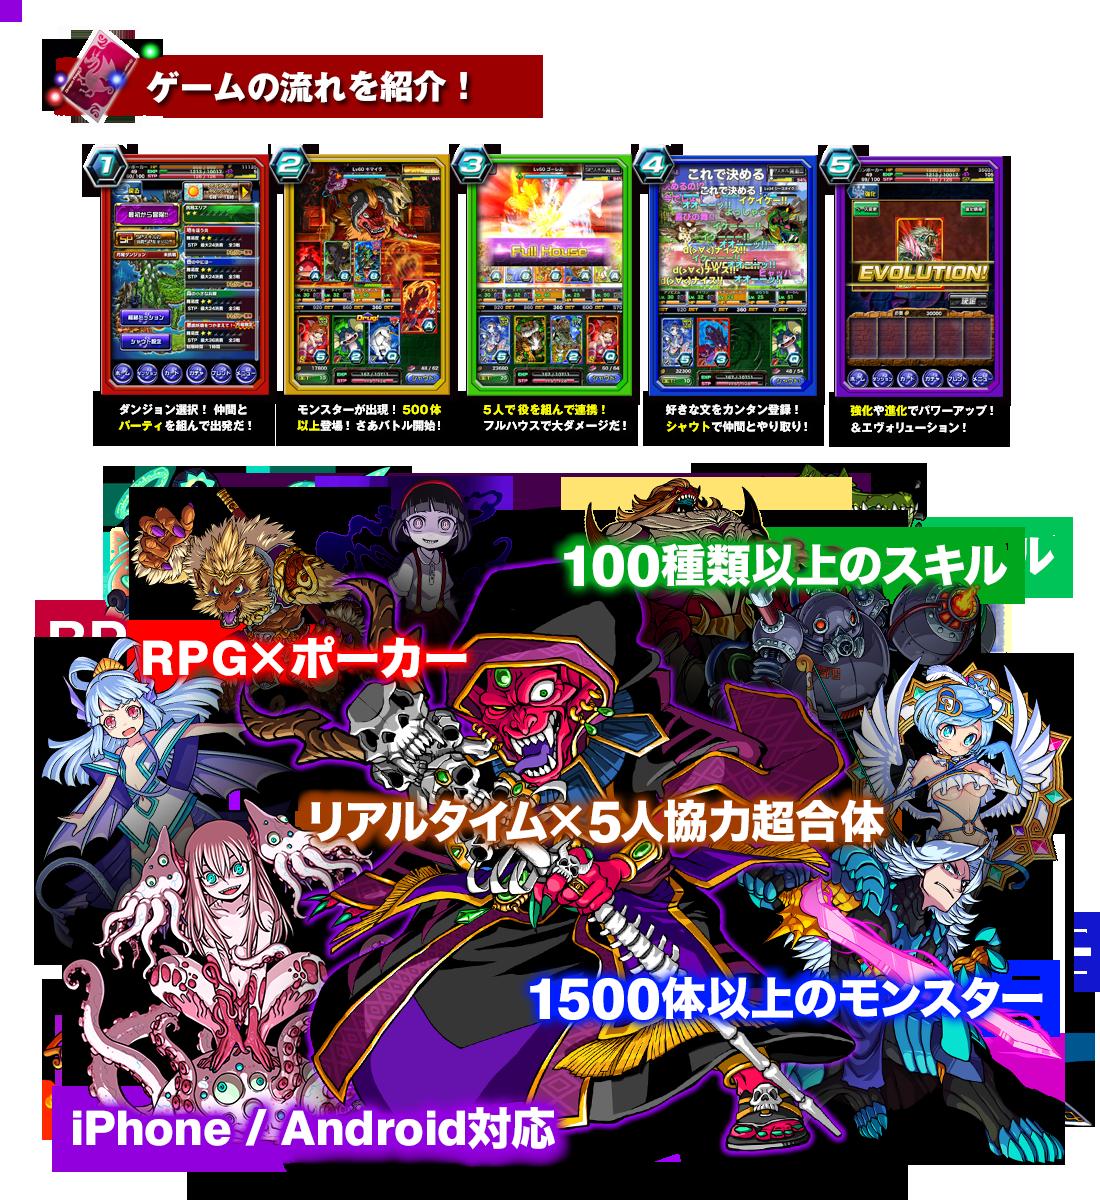 [img]http://www.asobism.co.jp/social/dragonpoker/img/img_top_01.png[/img]